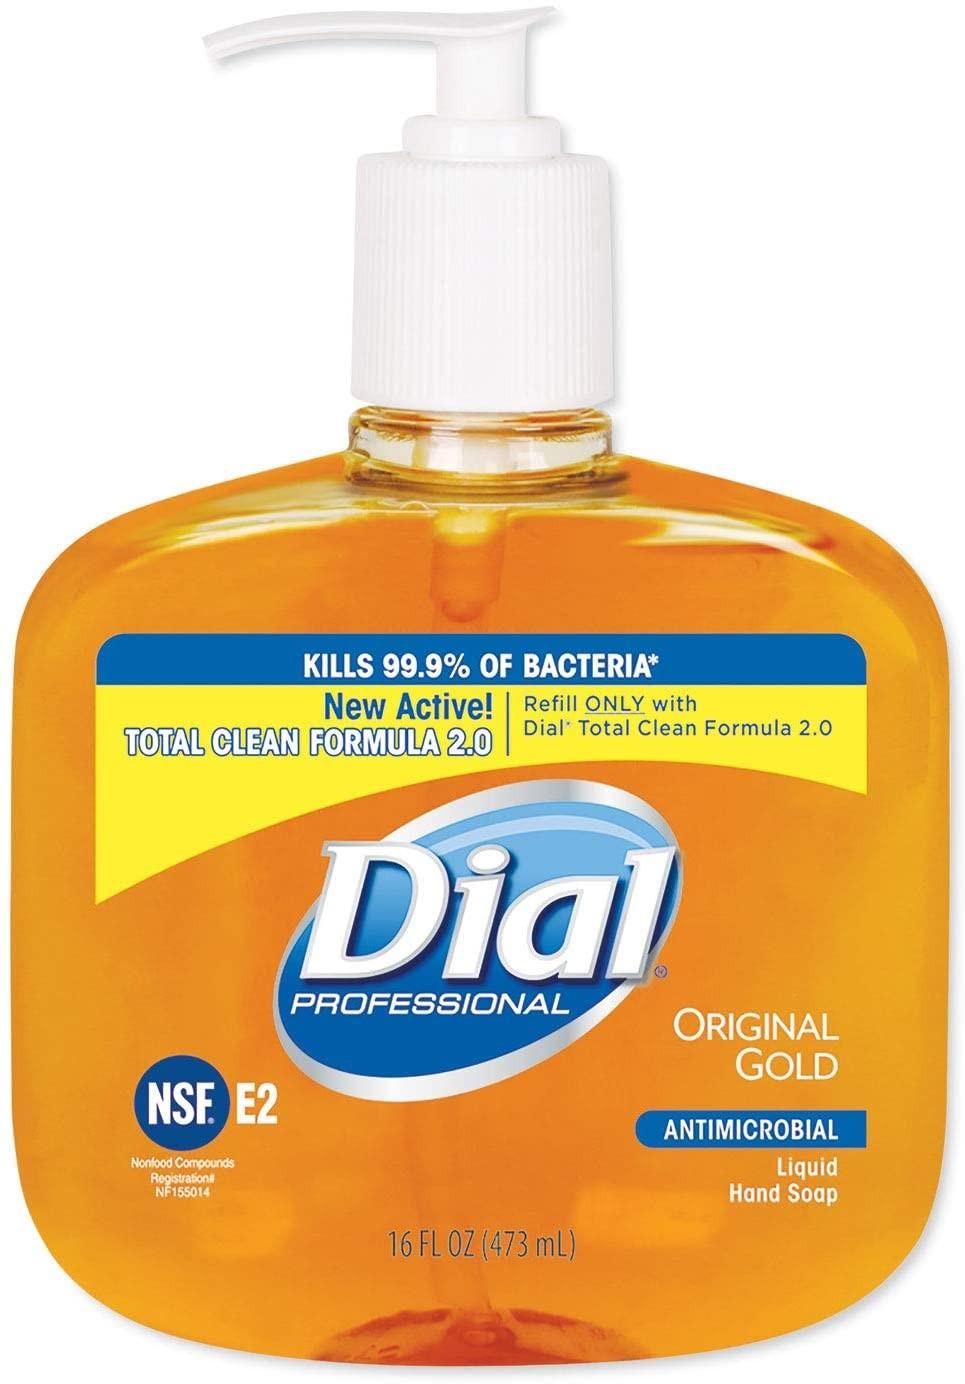 Dial Gold Antimicrobial Hand Soap, Floral, 16 oz. Pump Bottle, 12/Carton